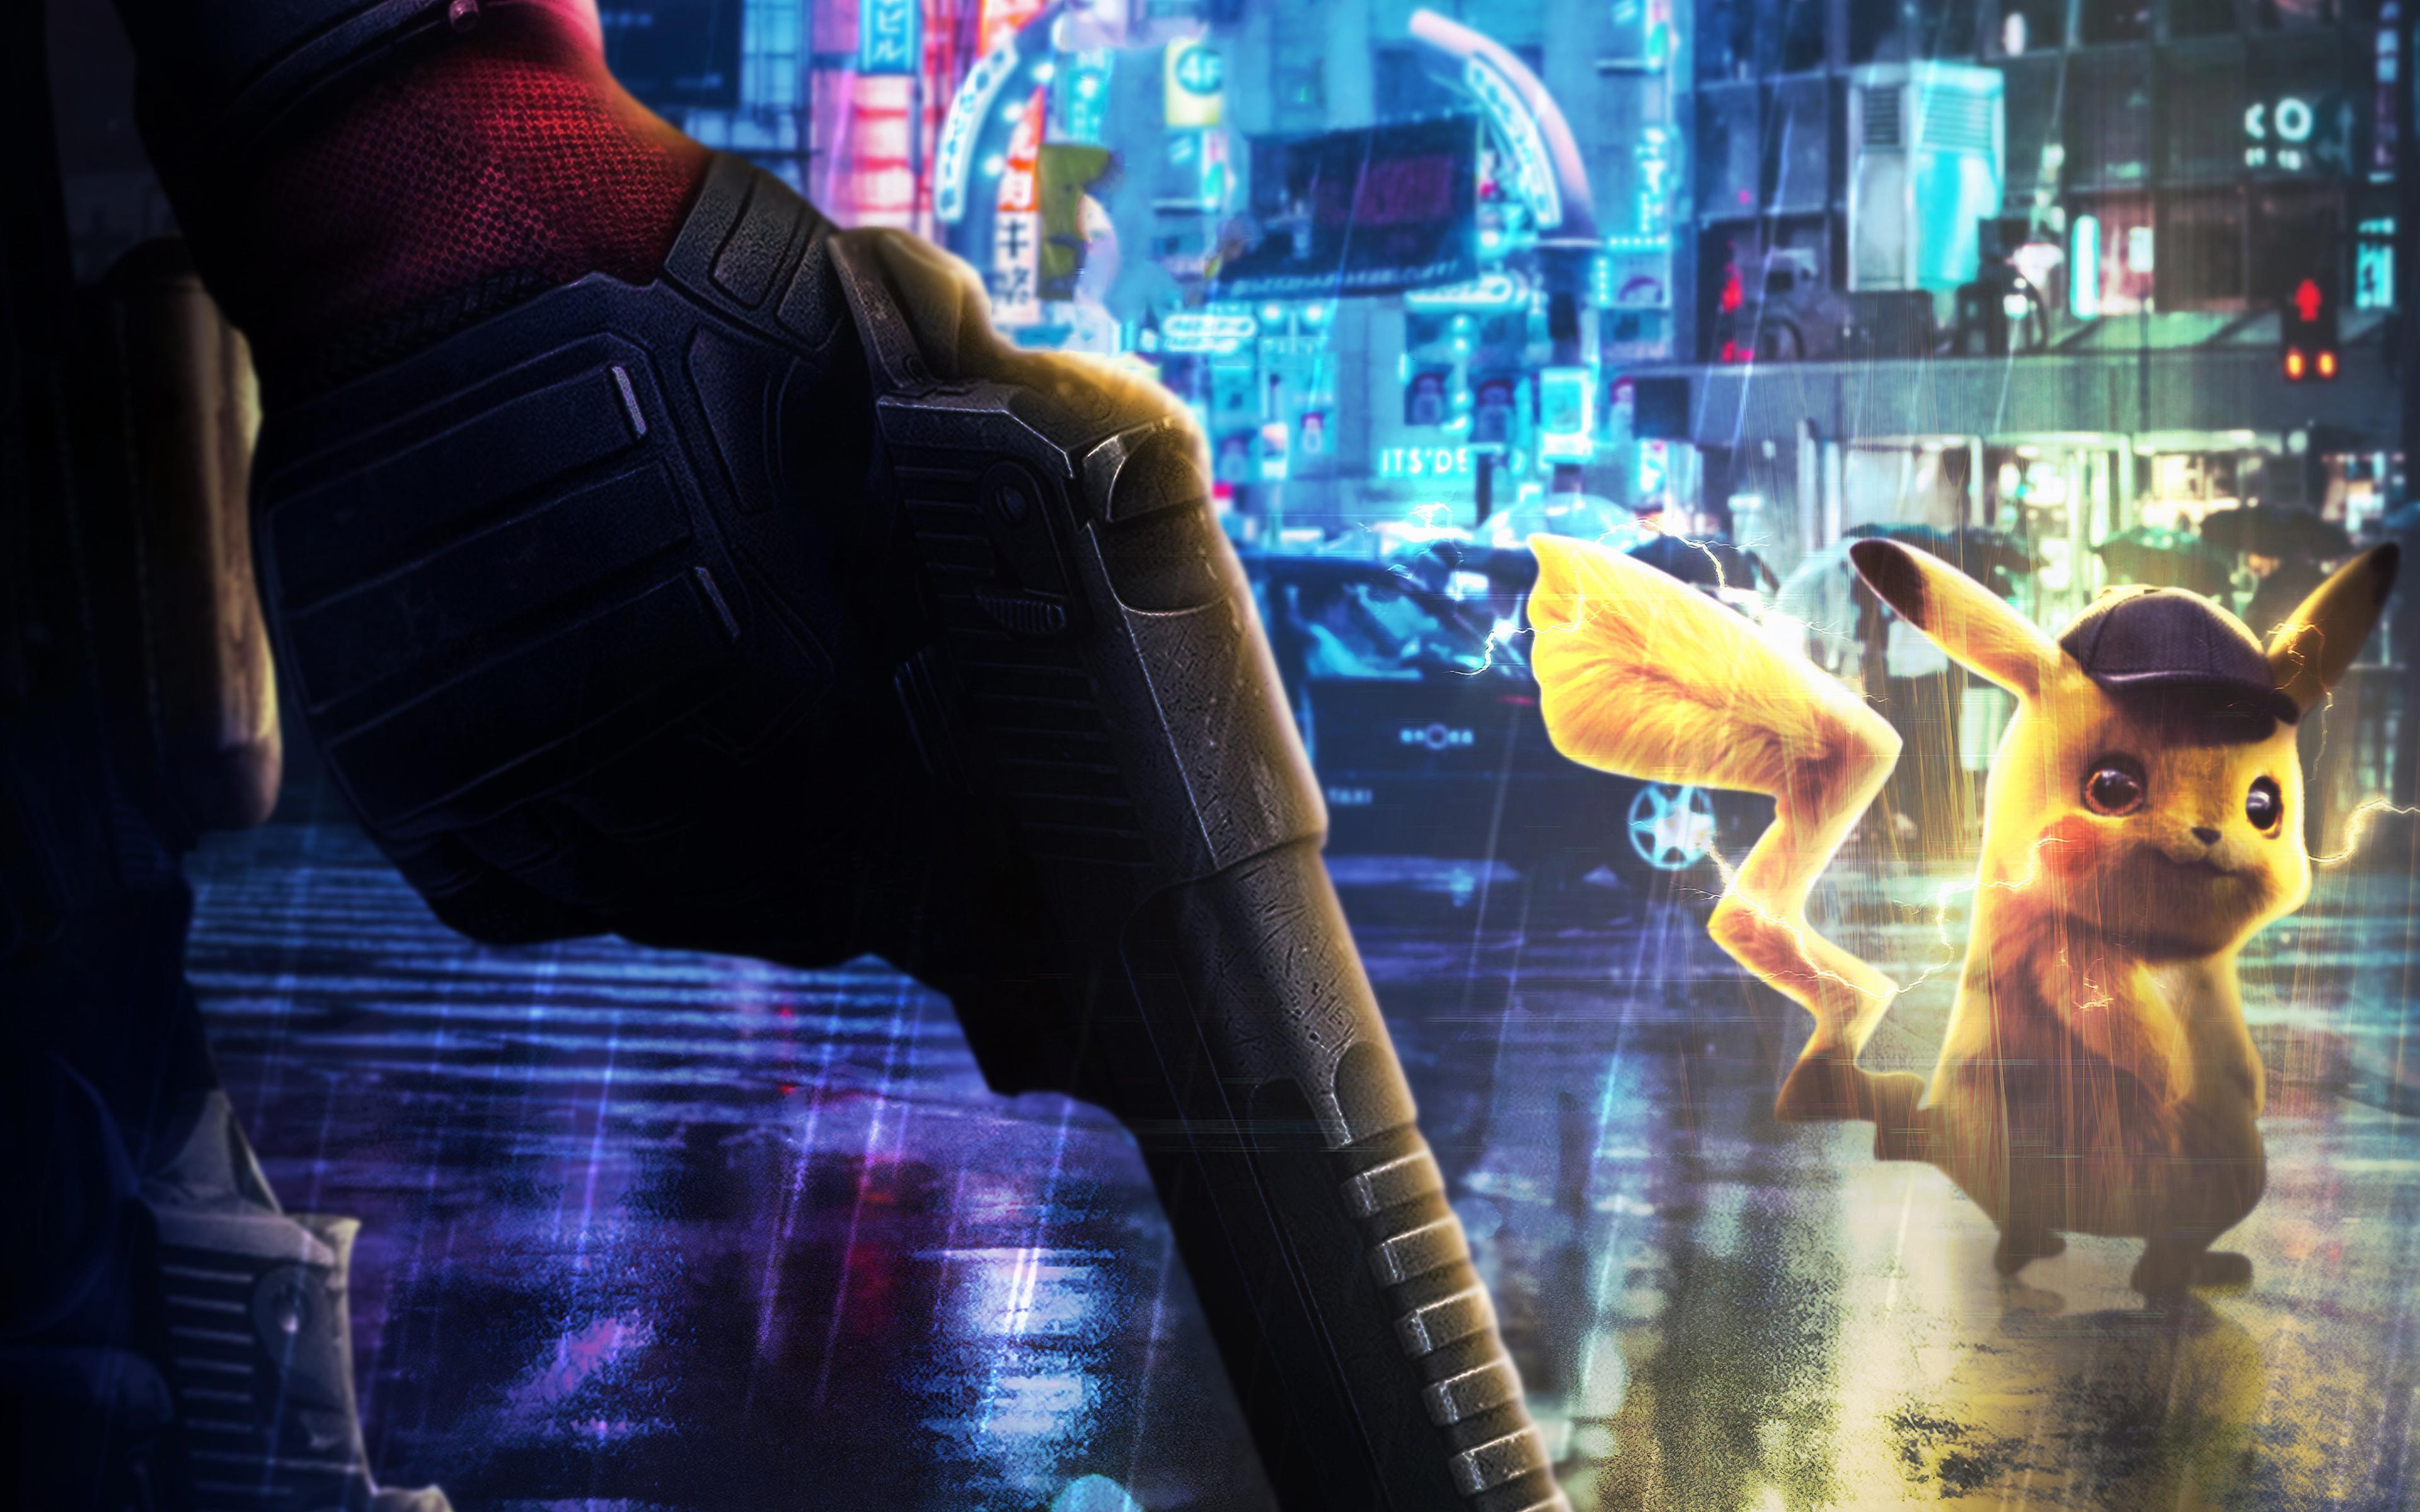 deadpool-vs-pikachu-2019-ee.jpg